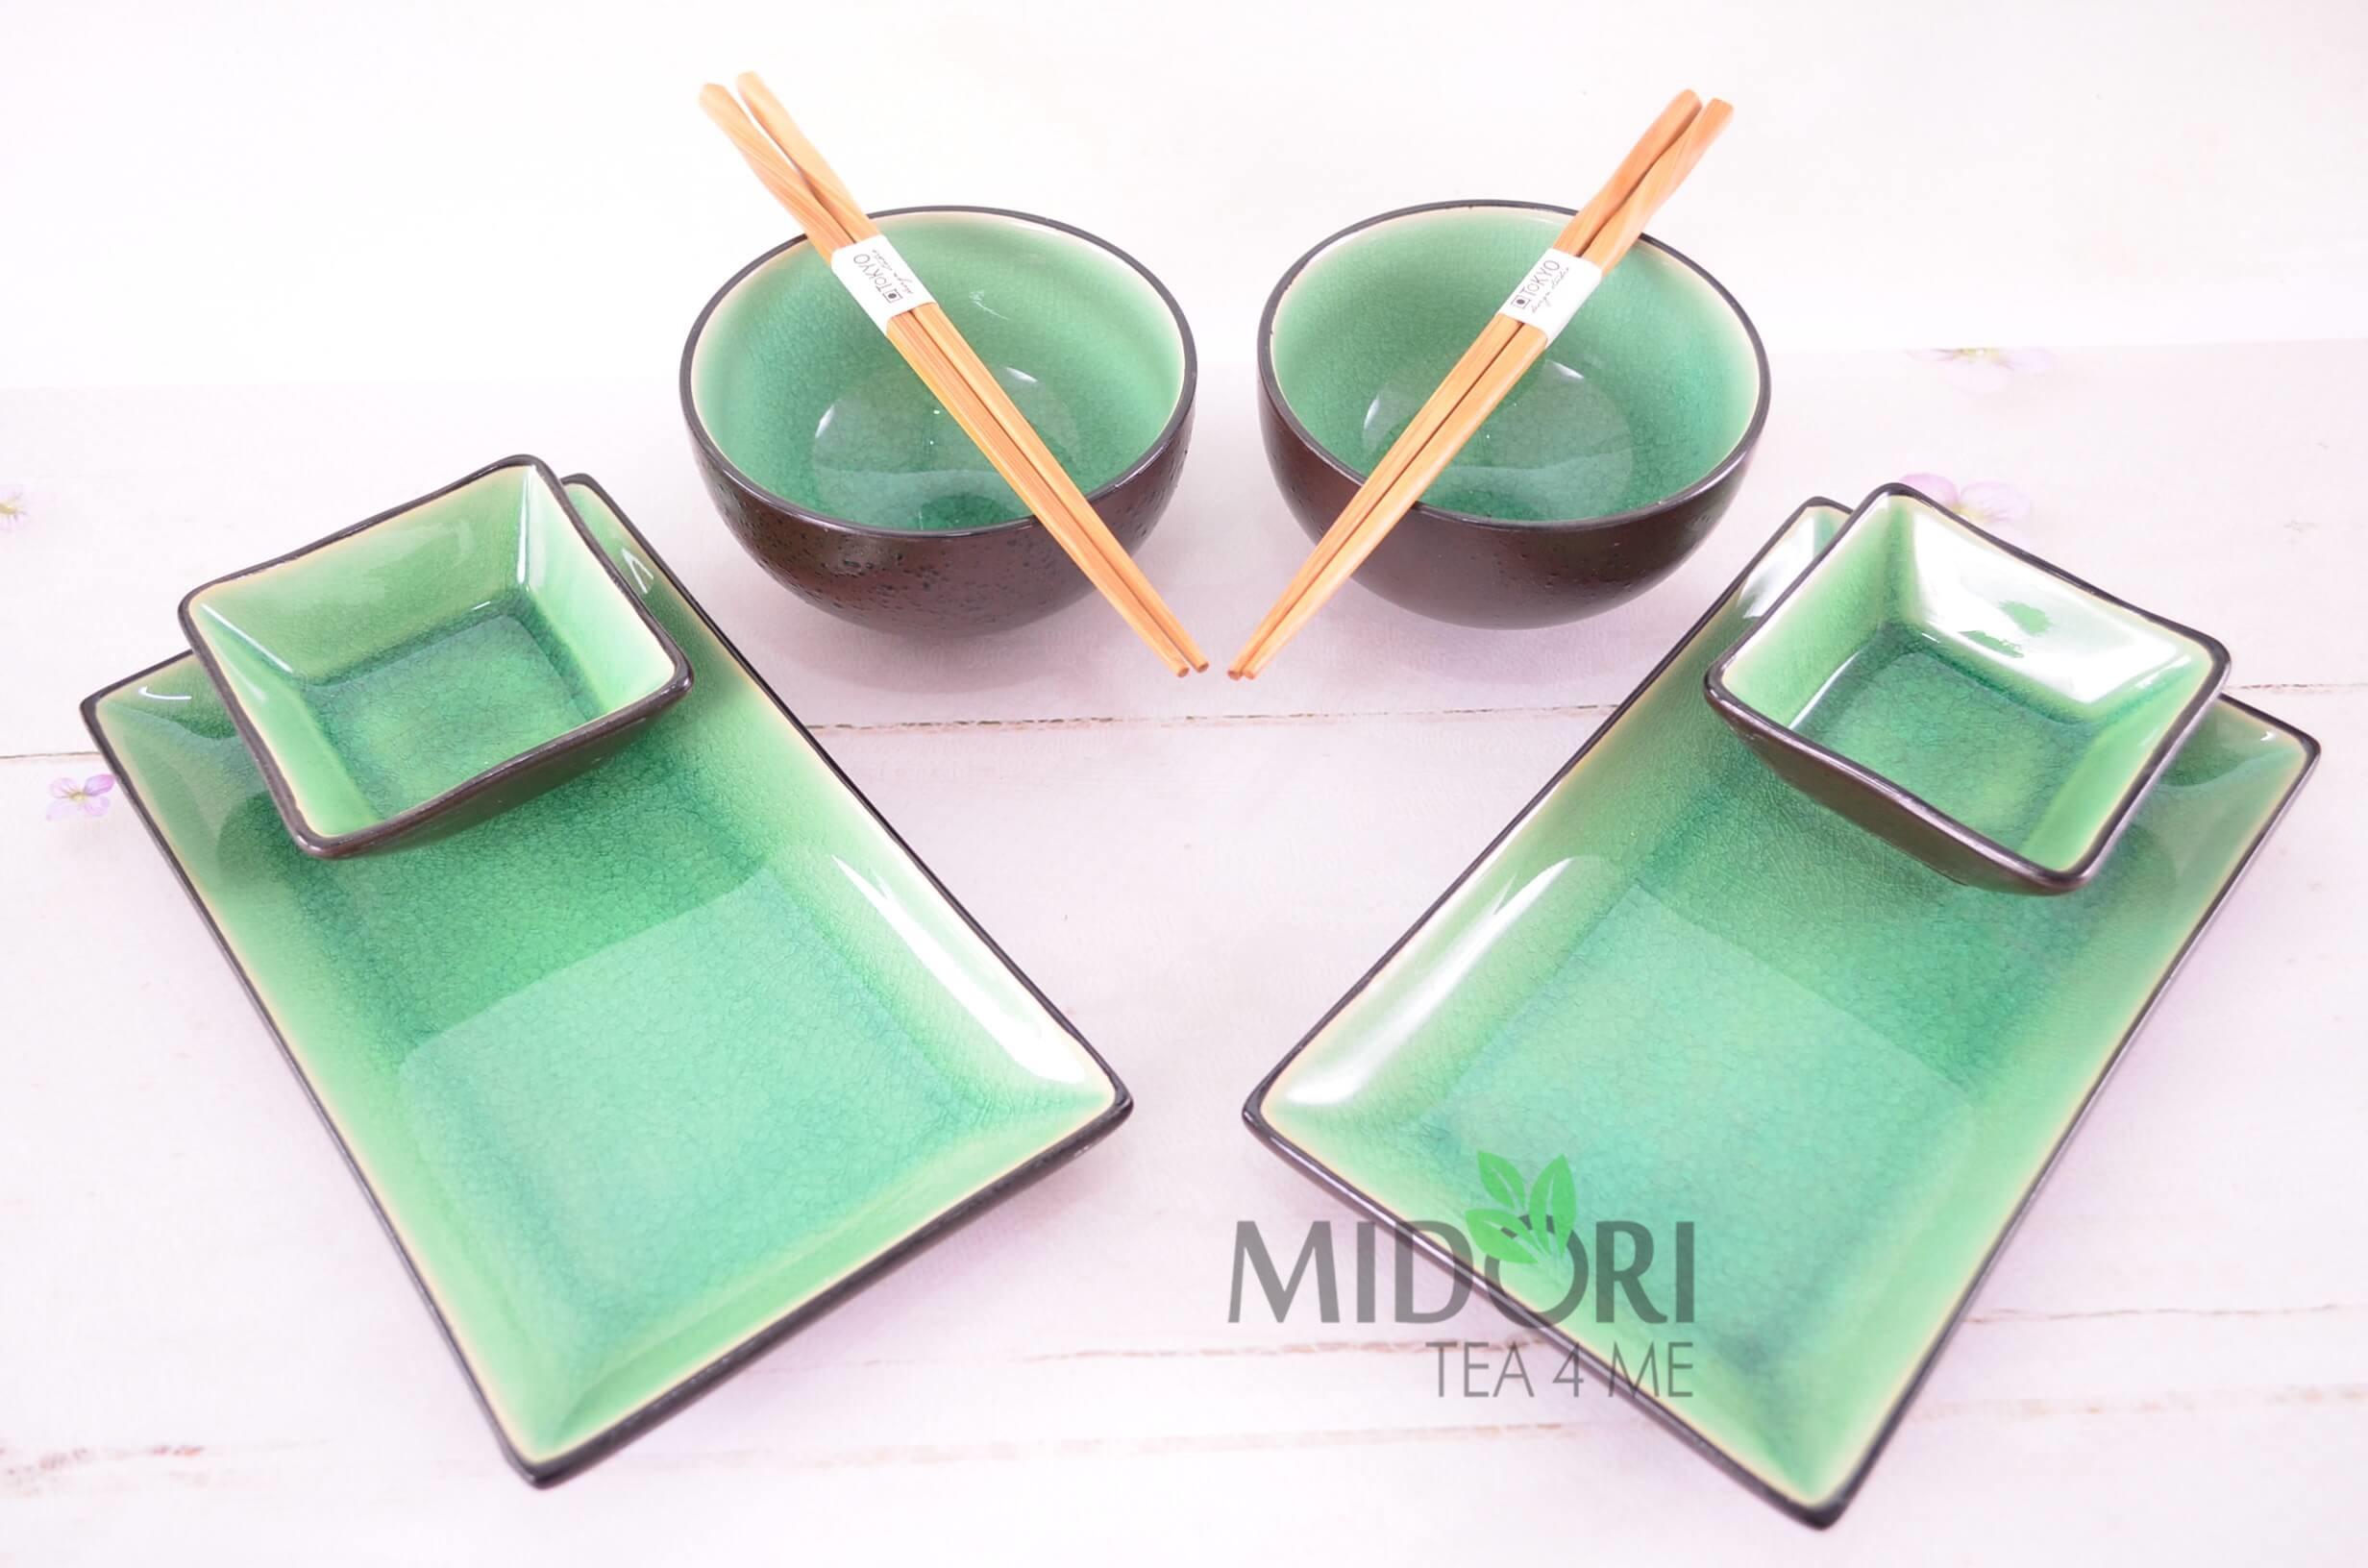 zestaw do sushi zielony, zestaw do sushi, komplet do sushi